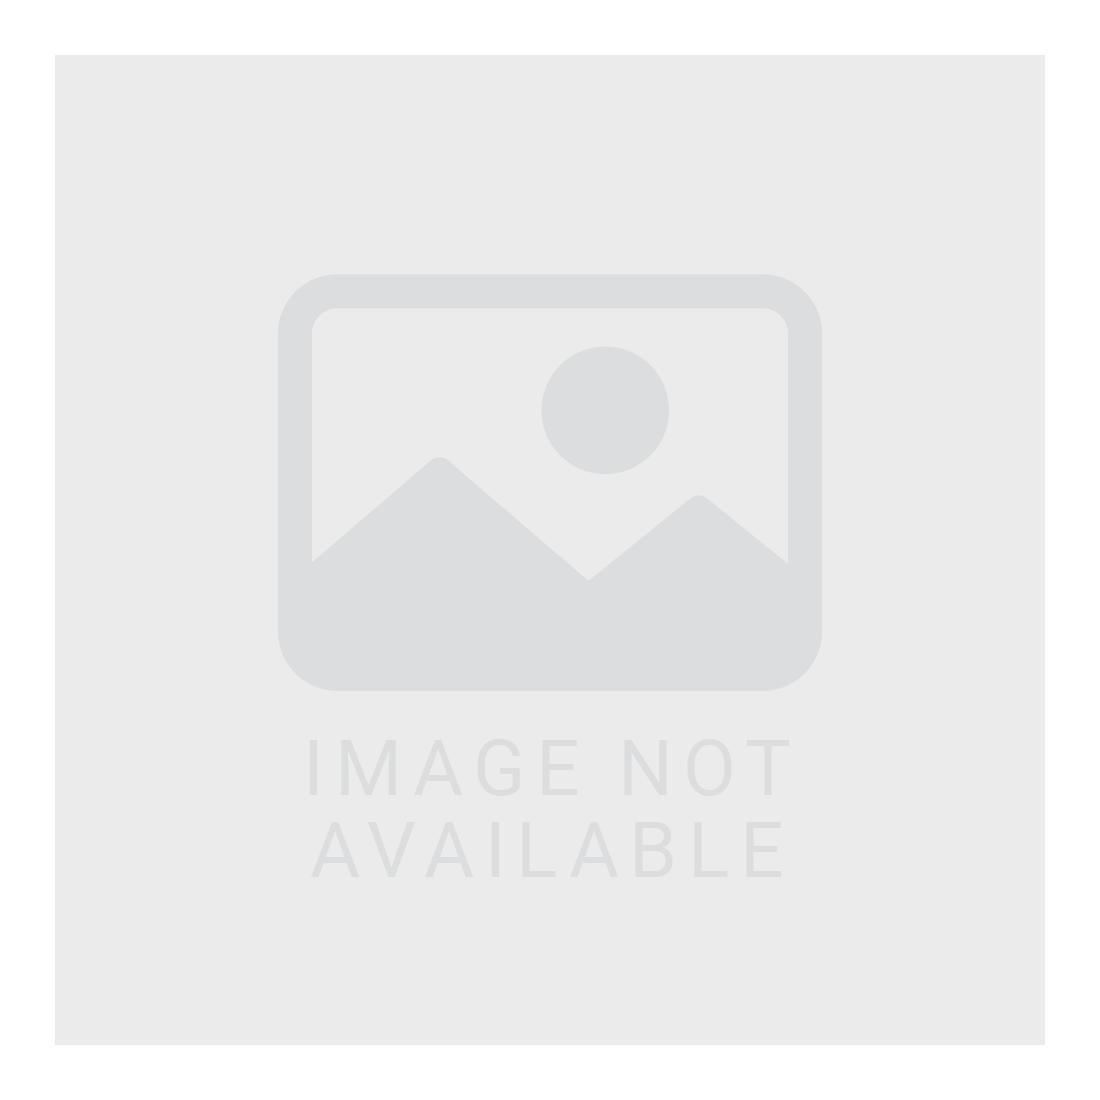 Gladiator 20 oz Mesa Bottle with Straw Lid